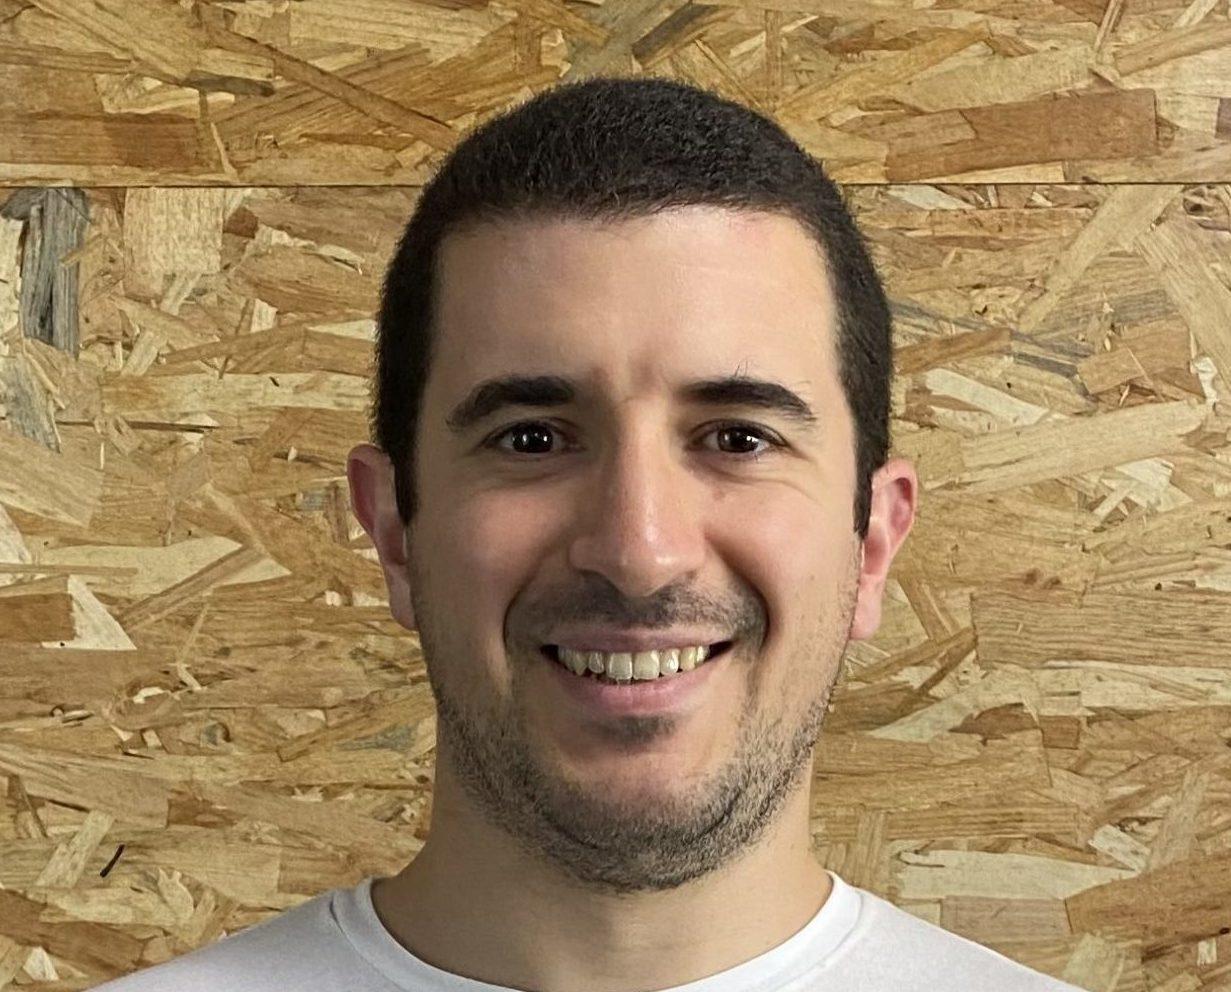 Manuel-coach-sportif-studio-3s